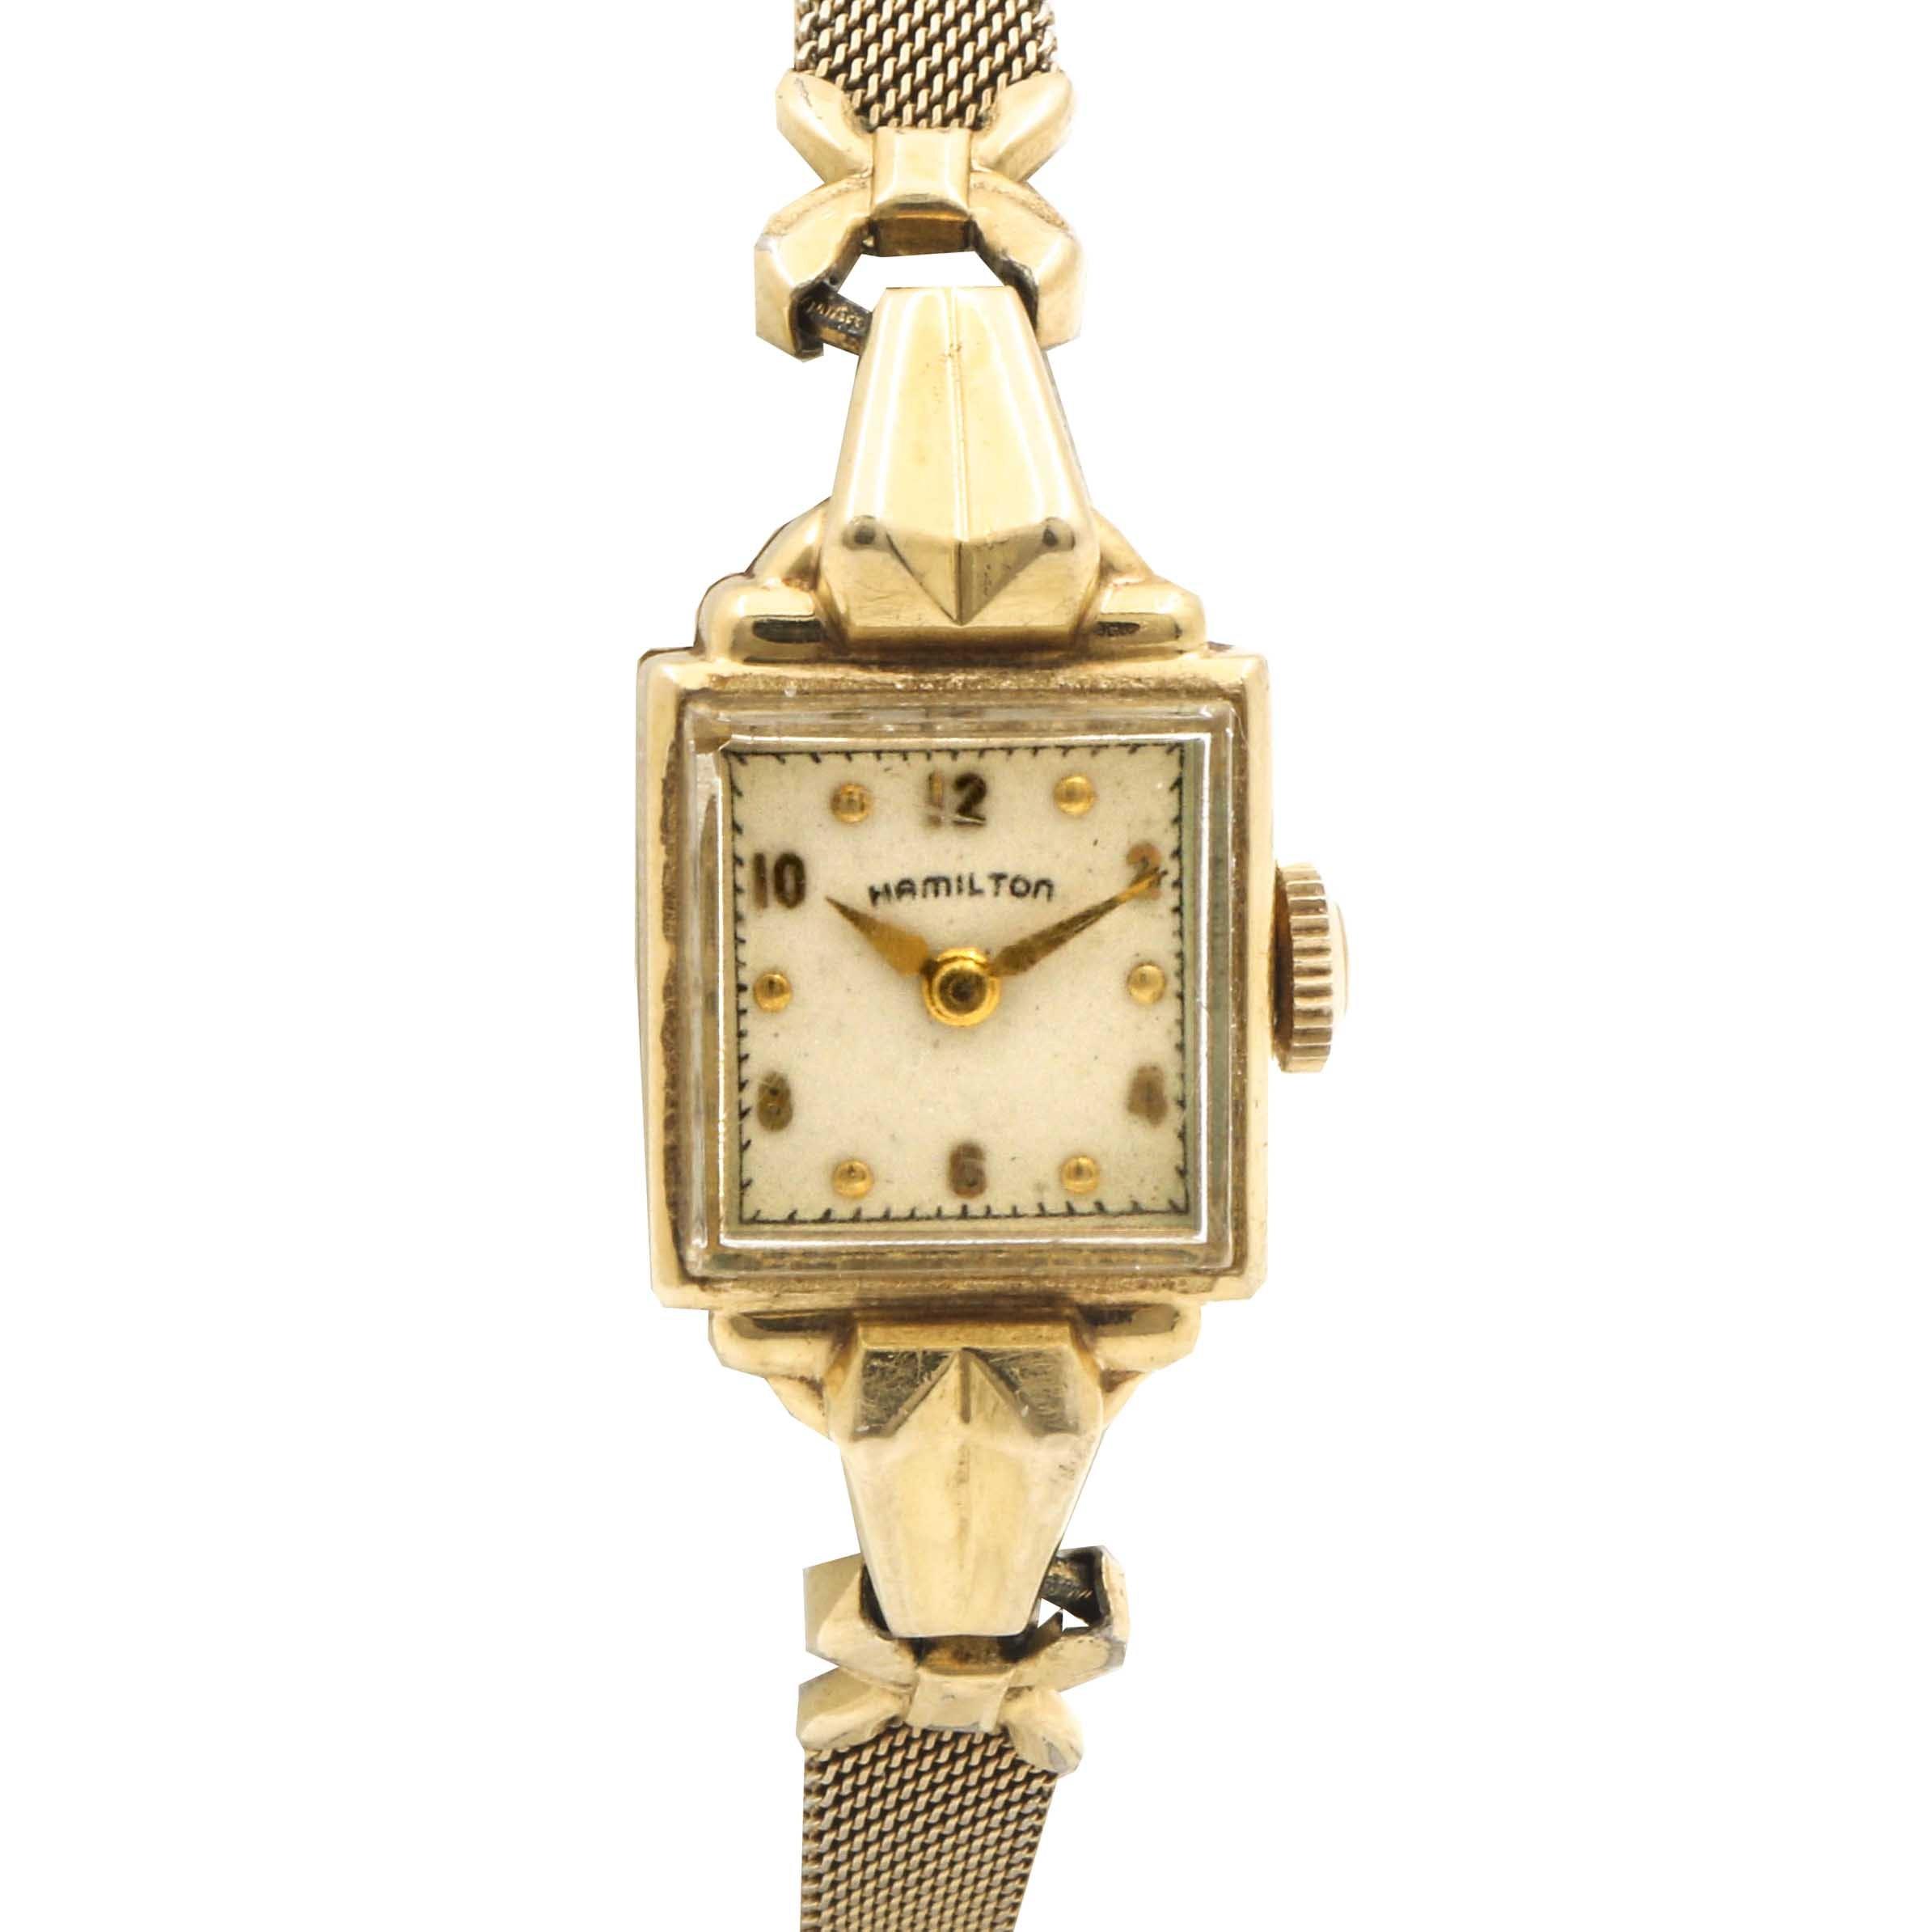 Hamilton 14K Yellow Gold Wristwatch